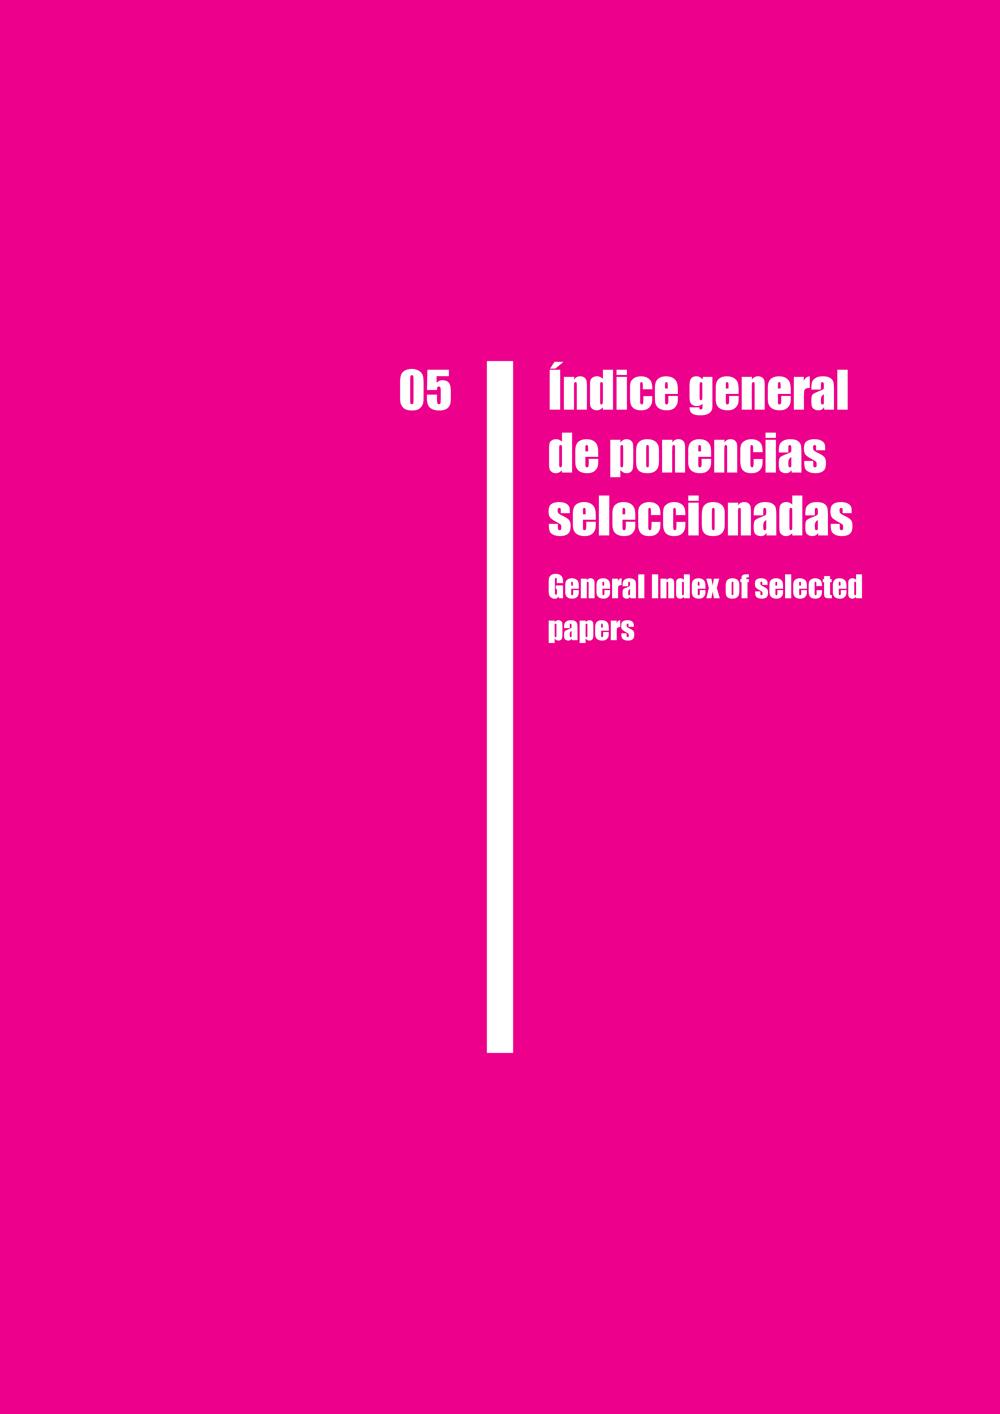 CRITICALL_Proceedings-22_SM.jpg